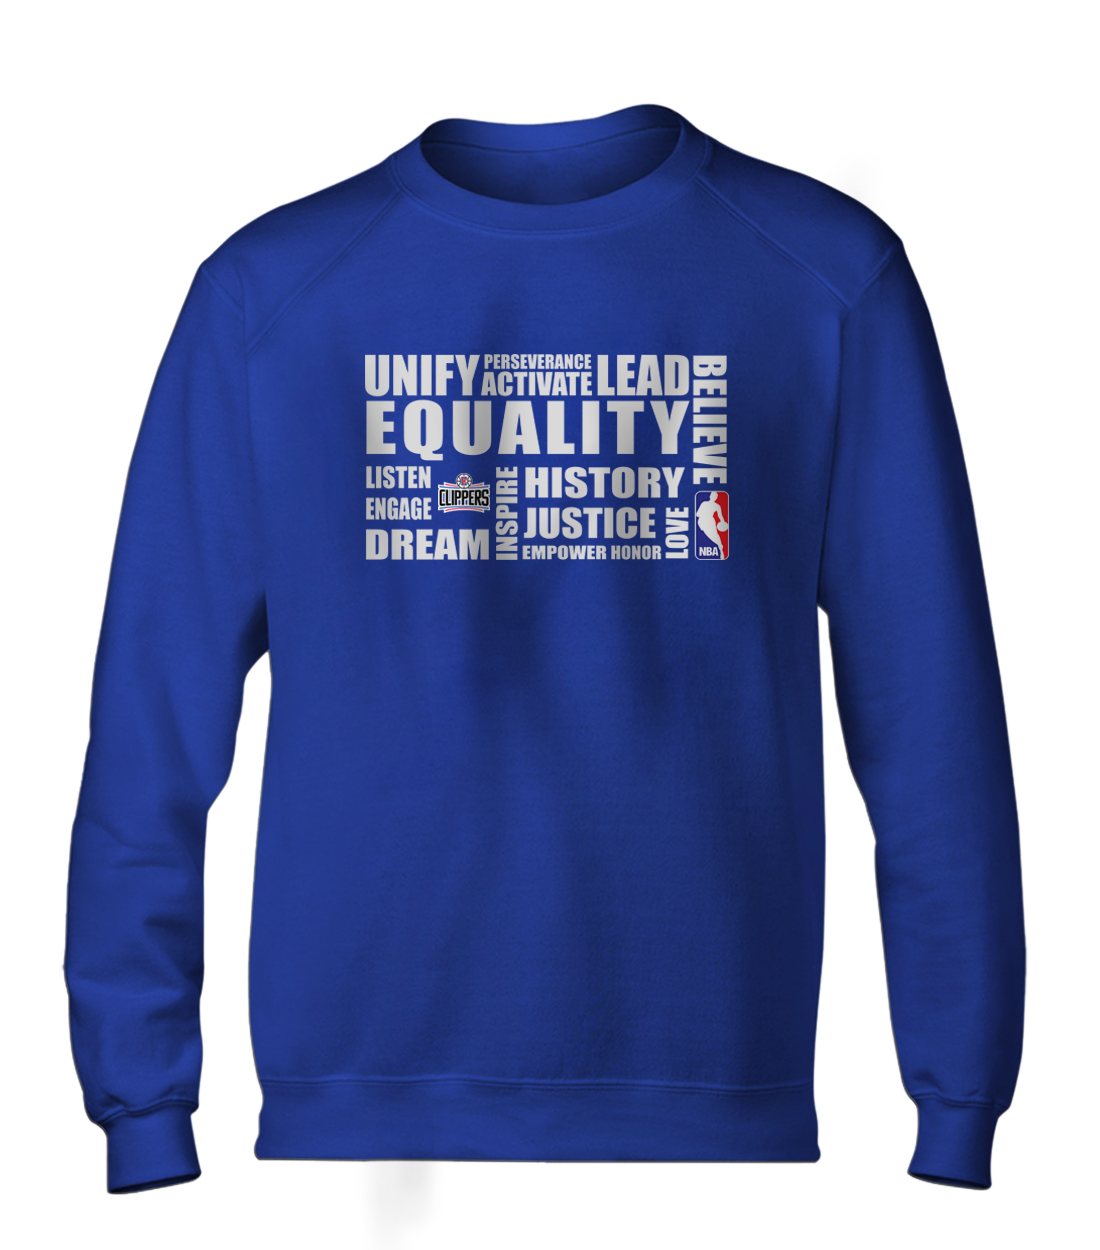 EQUALITY  L.A. Clippers  Basic (BSC-BLU-291-NBA-LAC.byz)